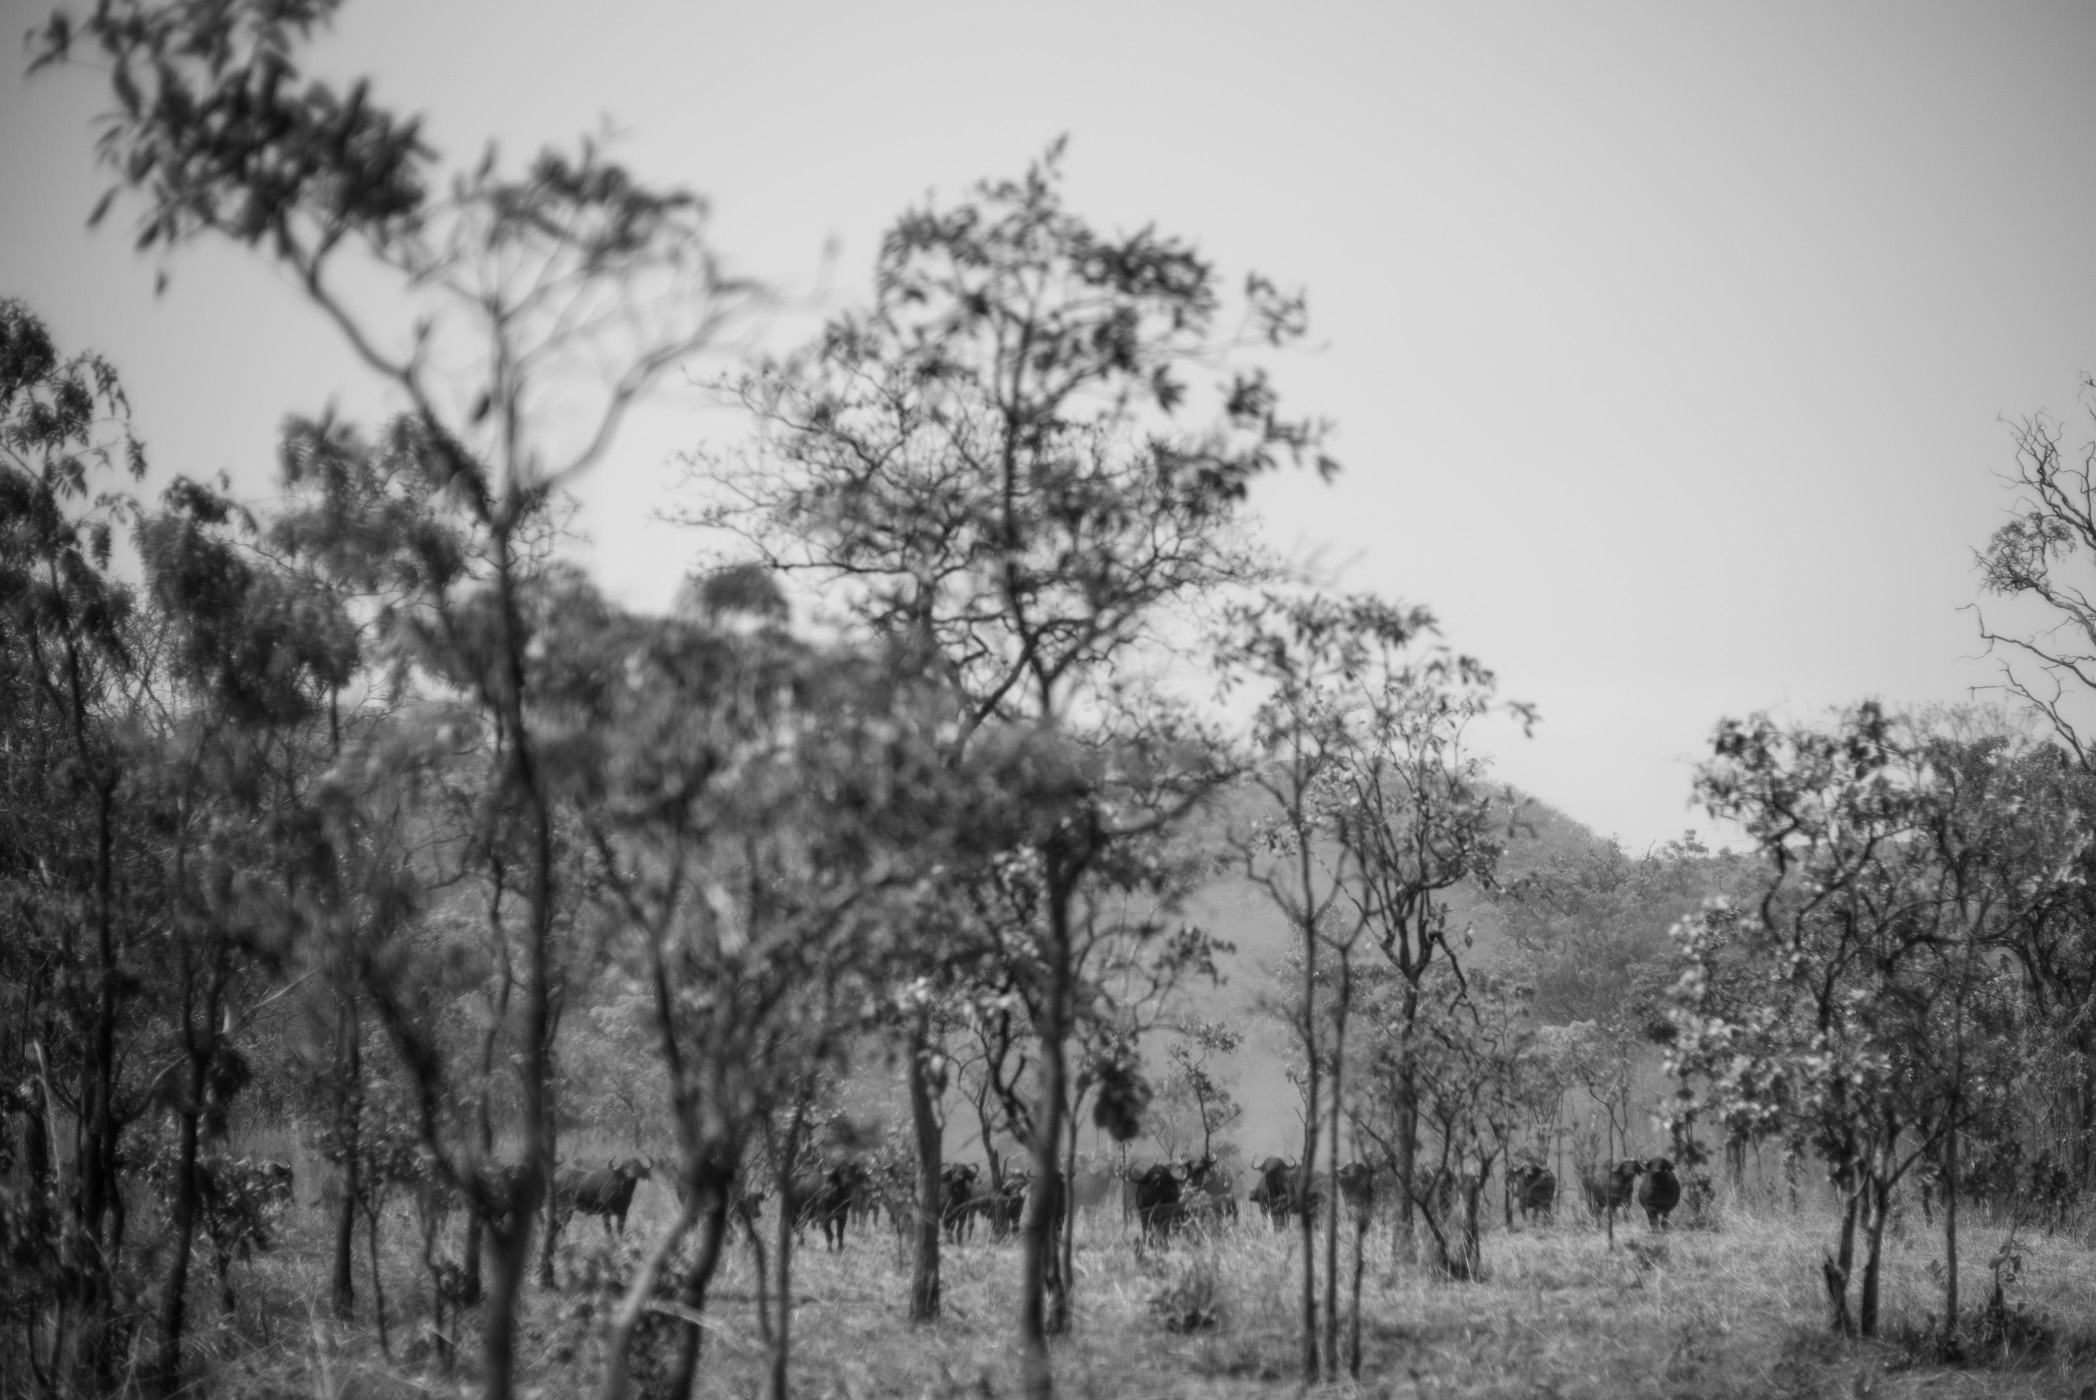 Cape Buffalo, Tanzania, Westley Richards